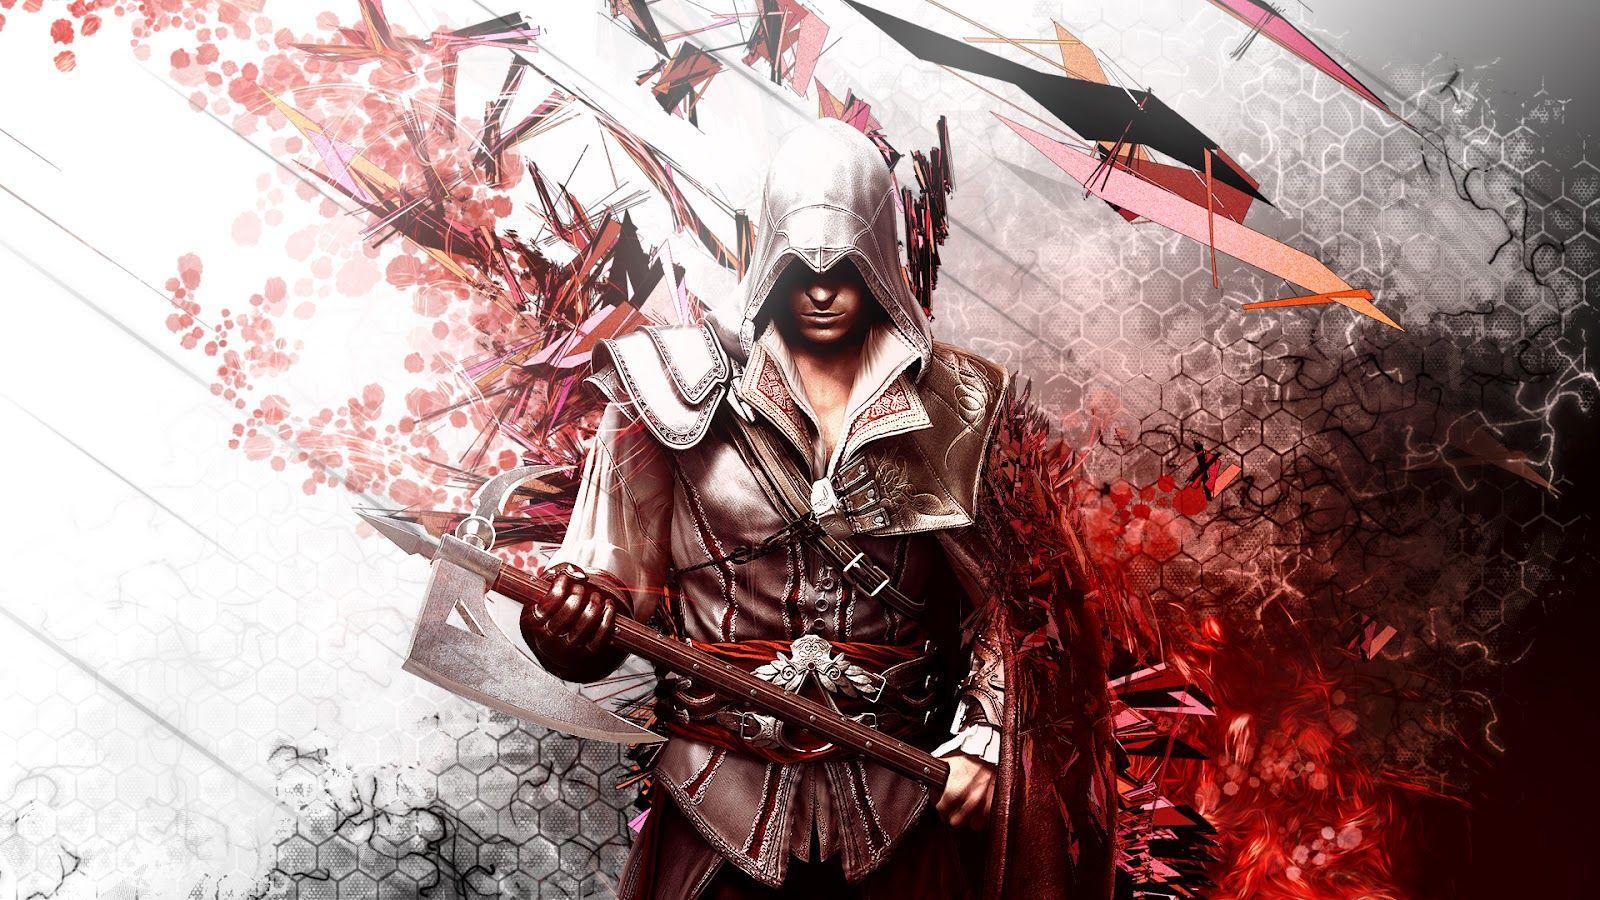 Assassins Creed Wallpaper HD 1080p WallpaperSafari